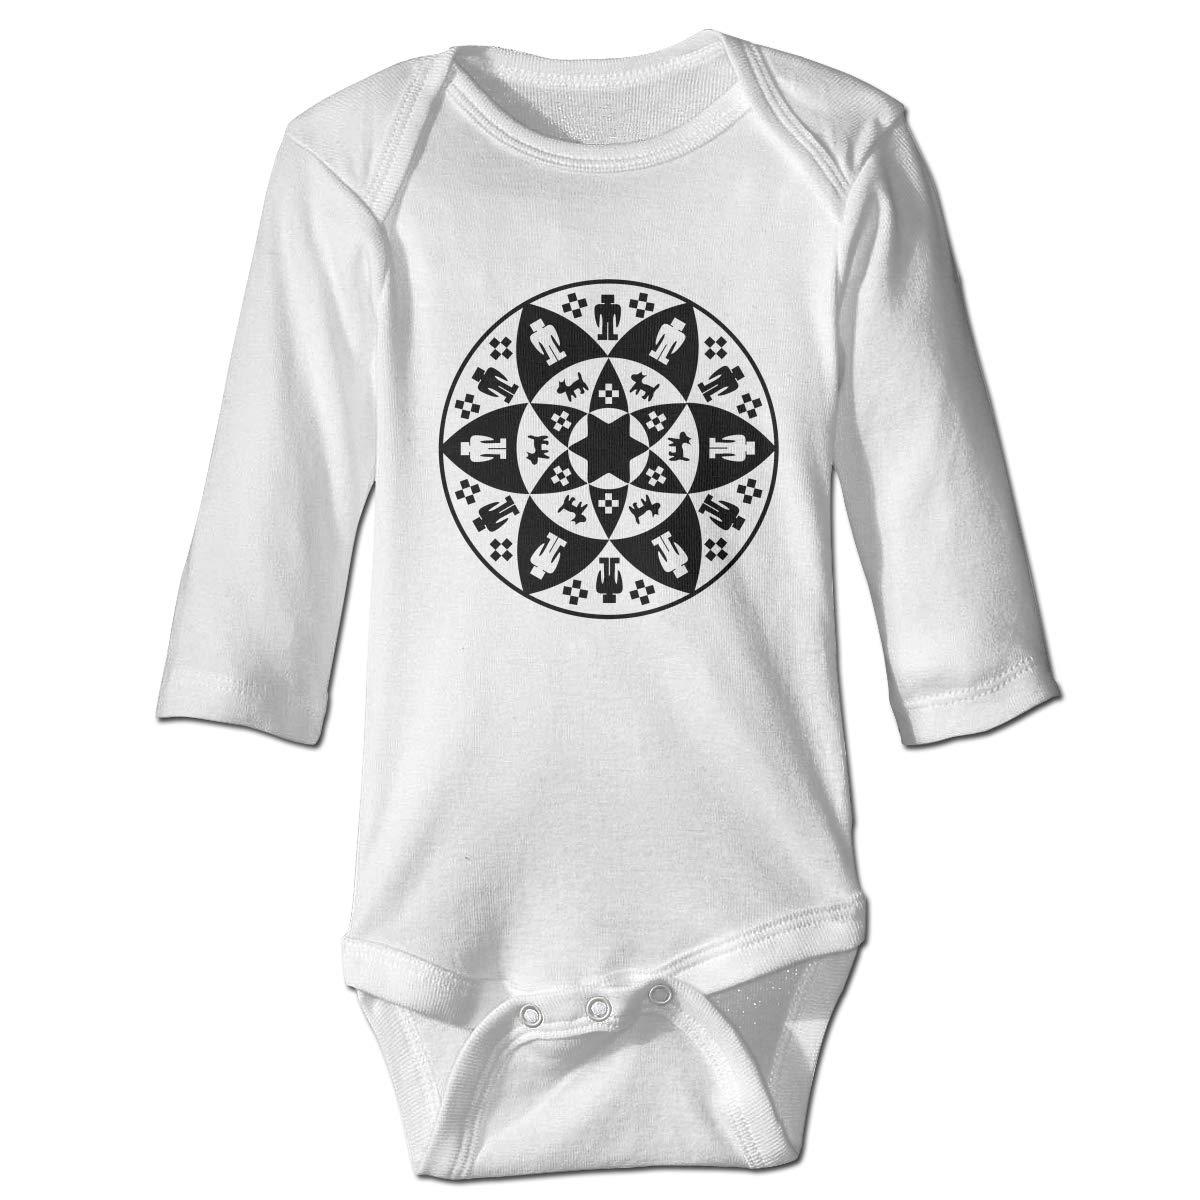 Yavapai-Prescott Tribe Long Sleeve Onesies Outfits